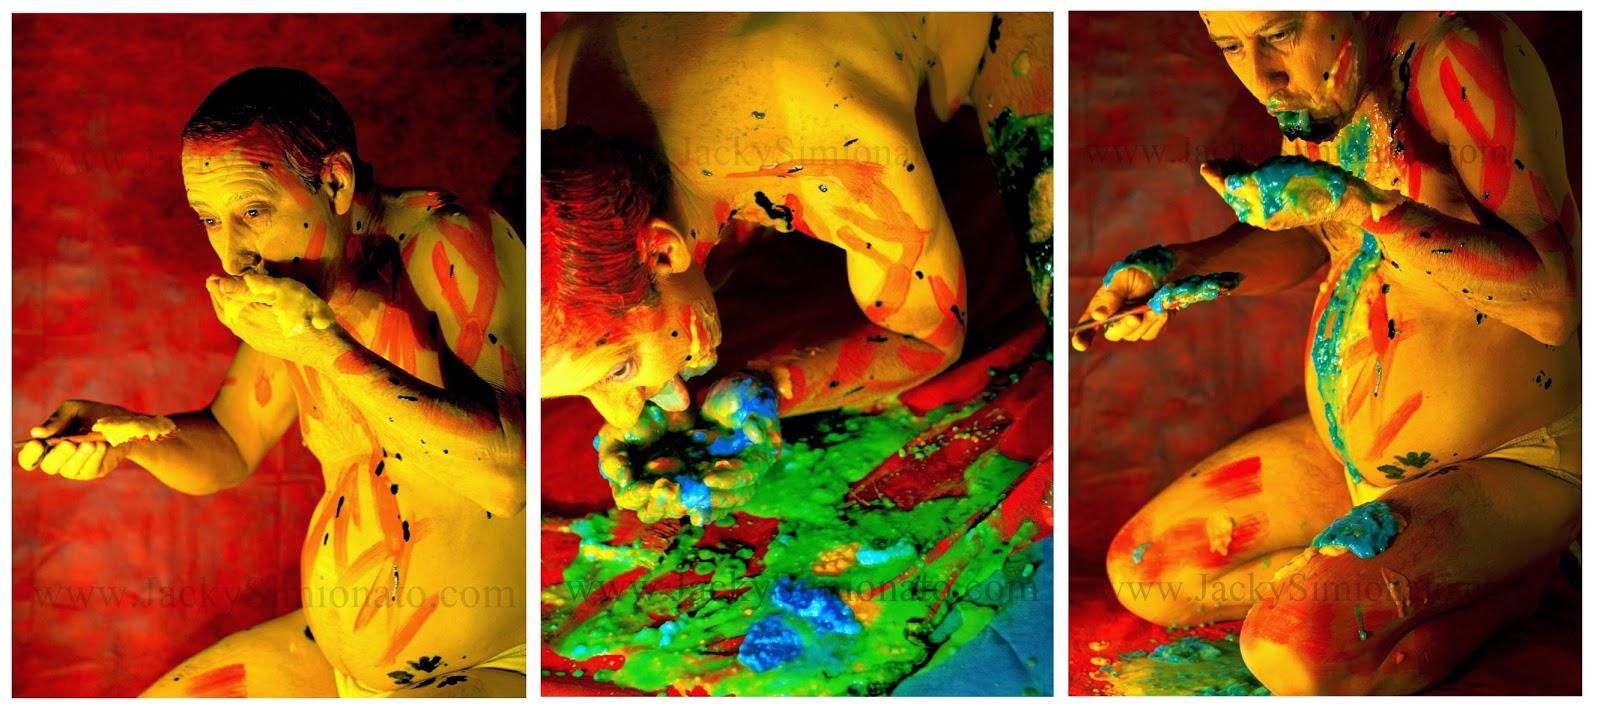 Jacky Simionato body art pintura corporal Guignard